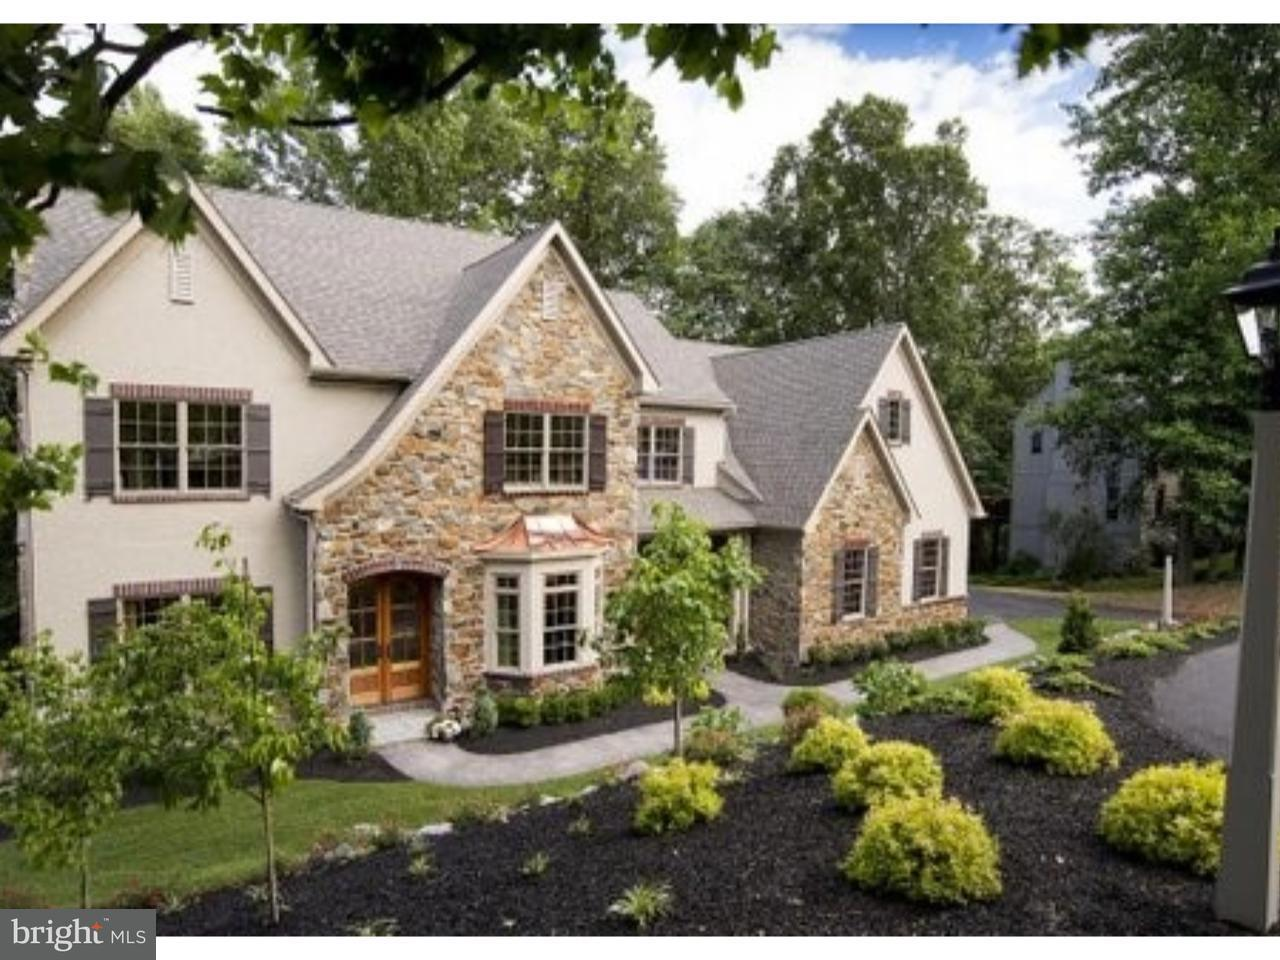 Single Family Home for Sale at 225 HUNTERS Lane Devon, Pennsylvania 19333 United States